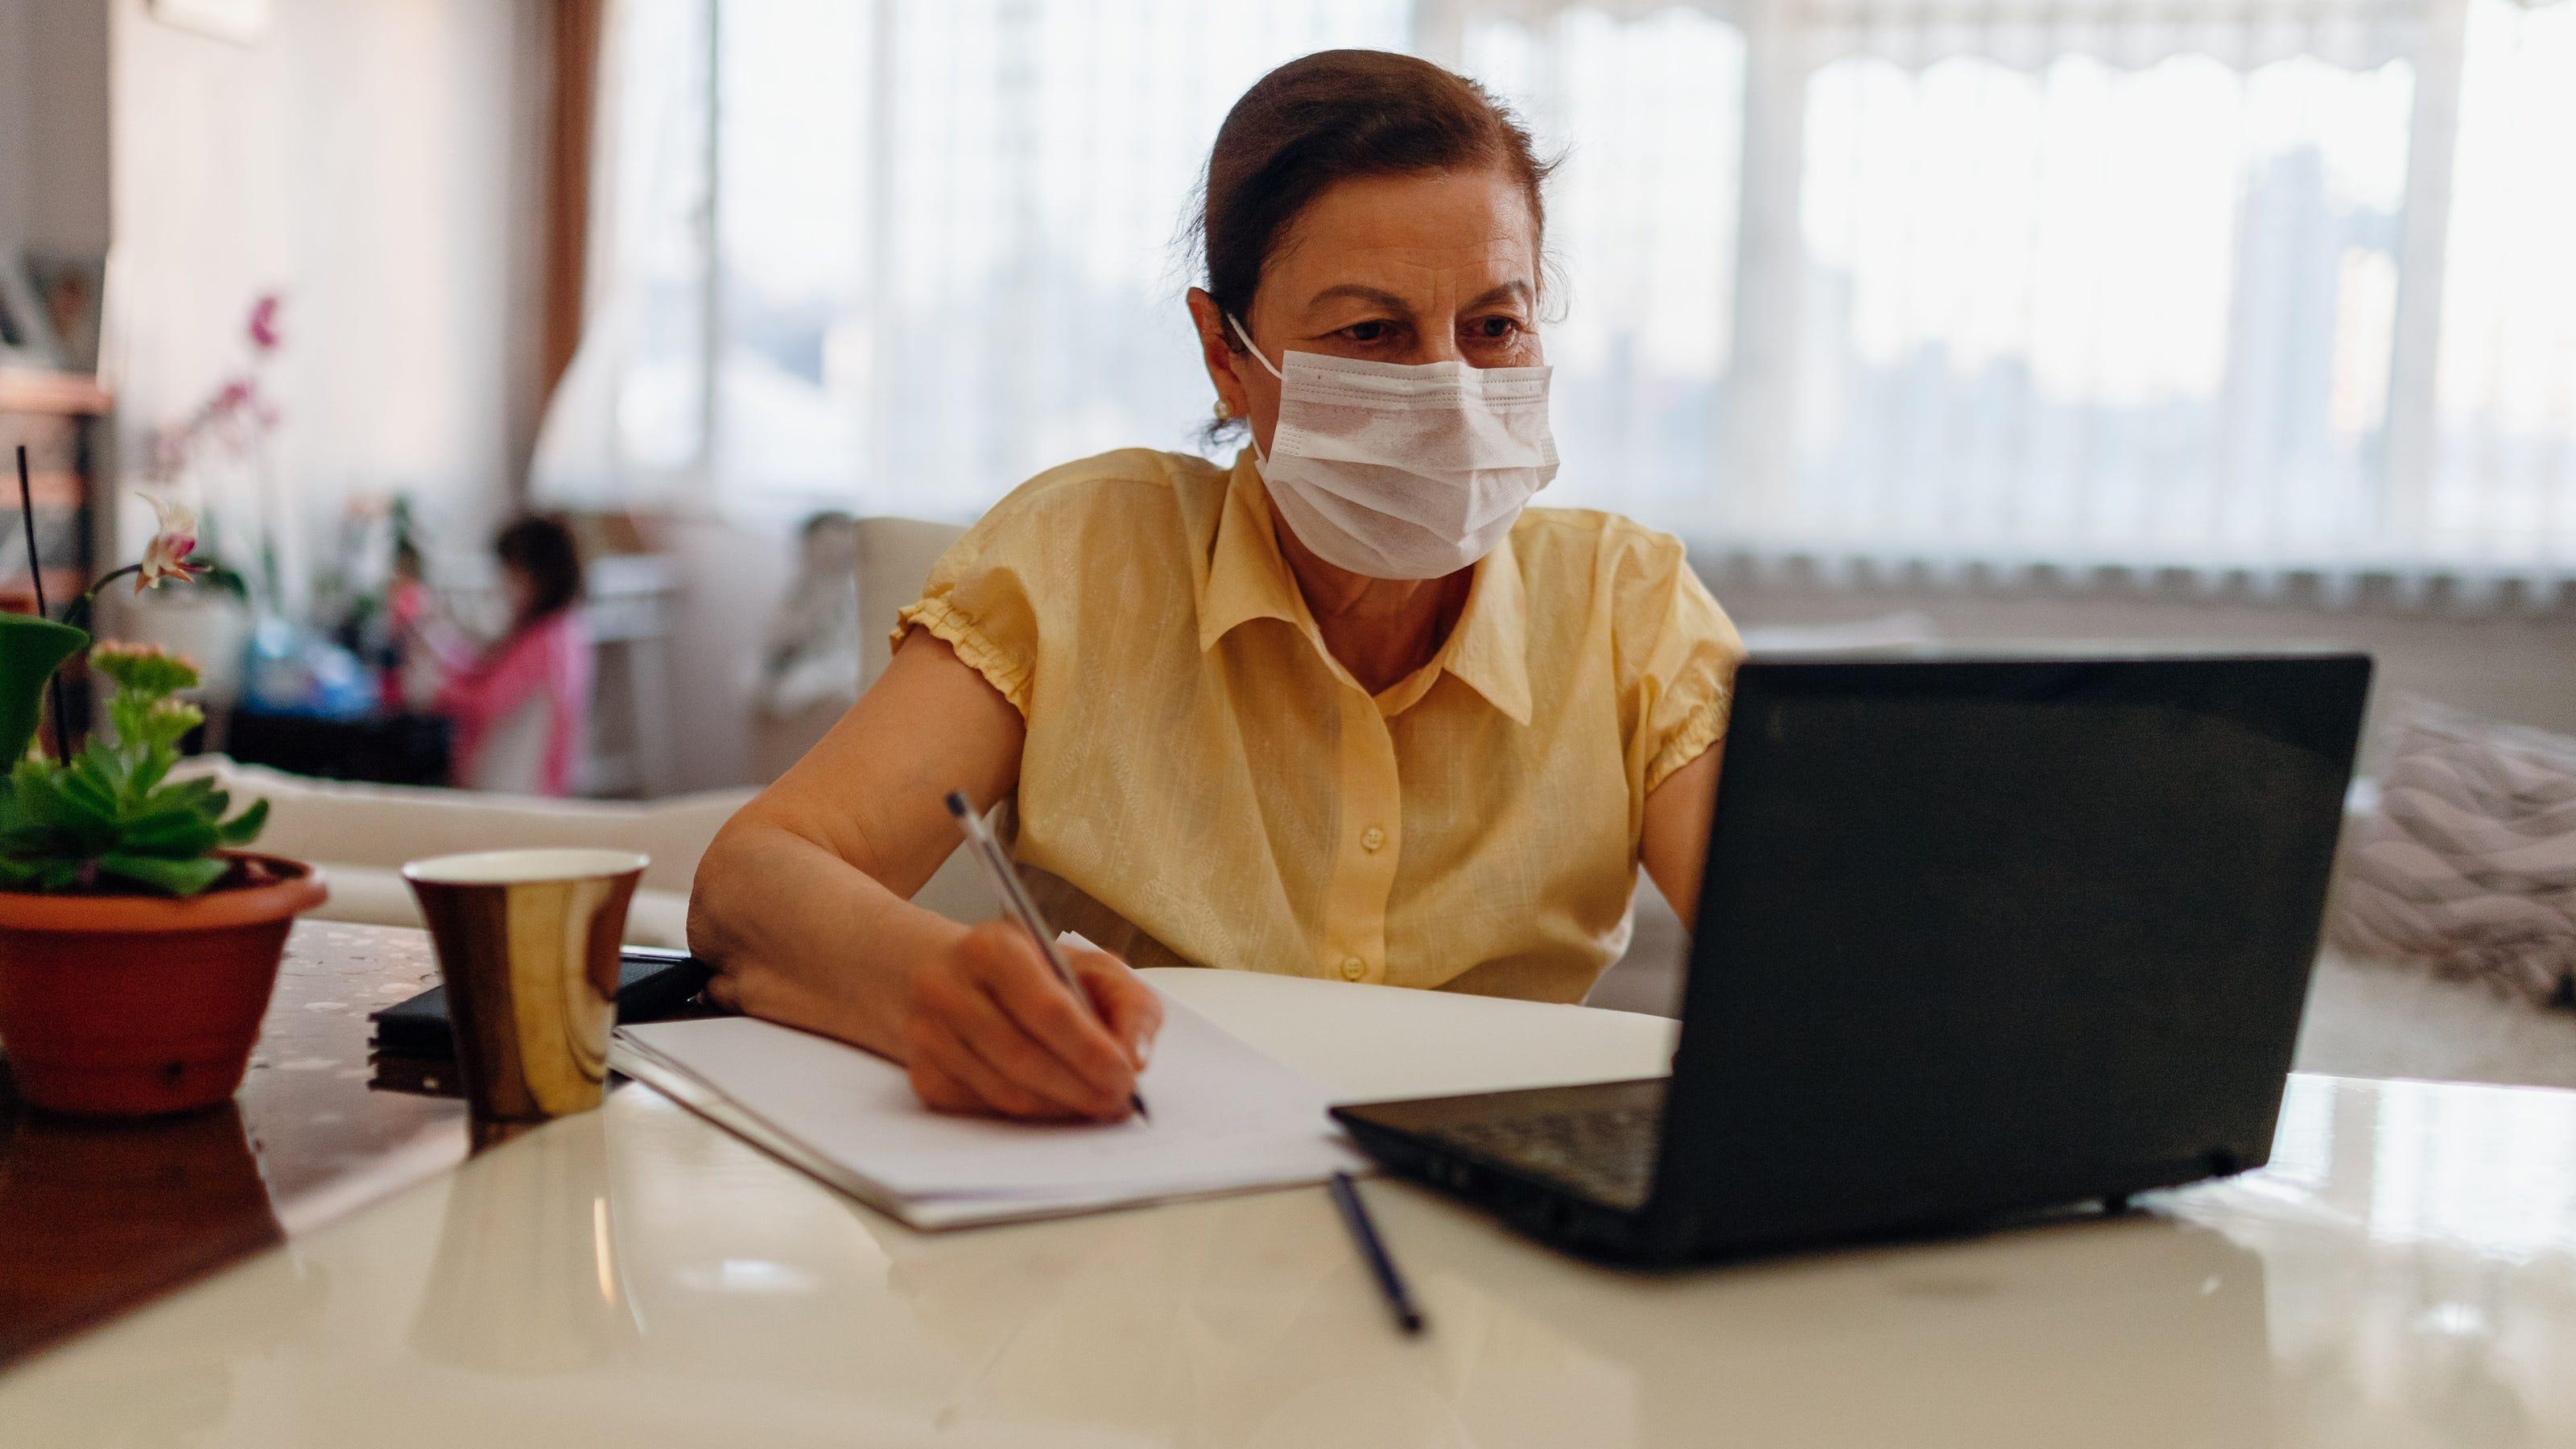 COVID-19 Pandemic: 5 Tips To Help ...facilityexecutive.com